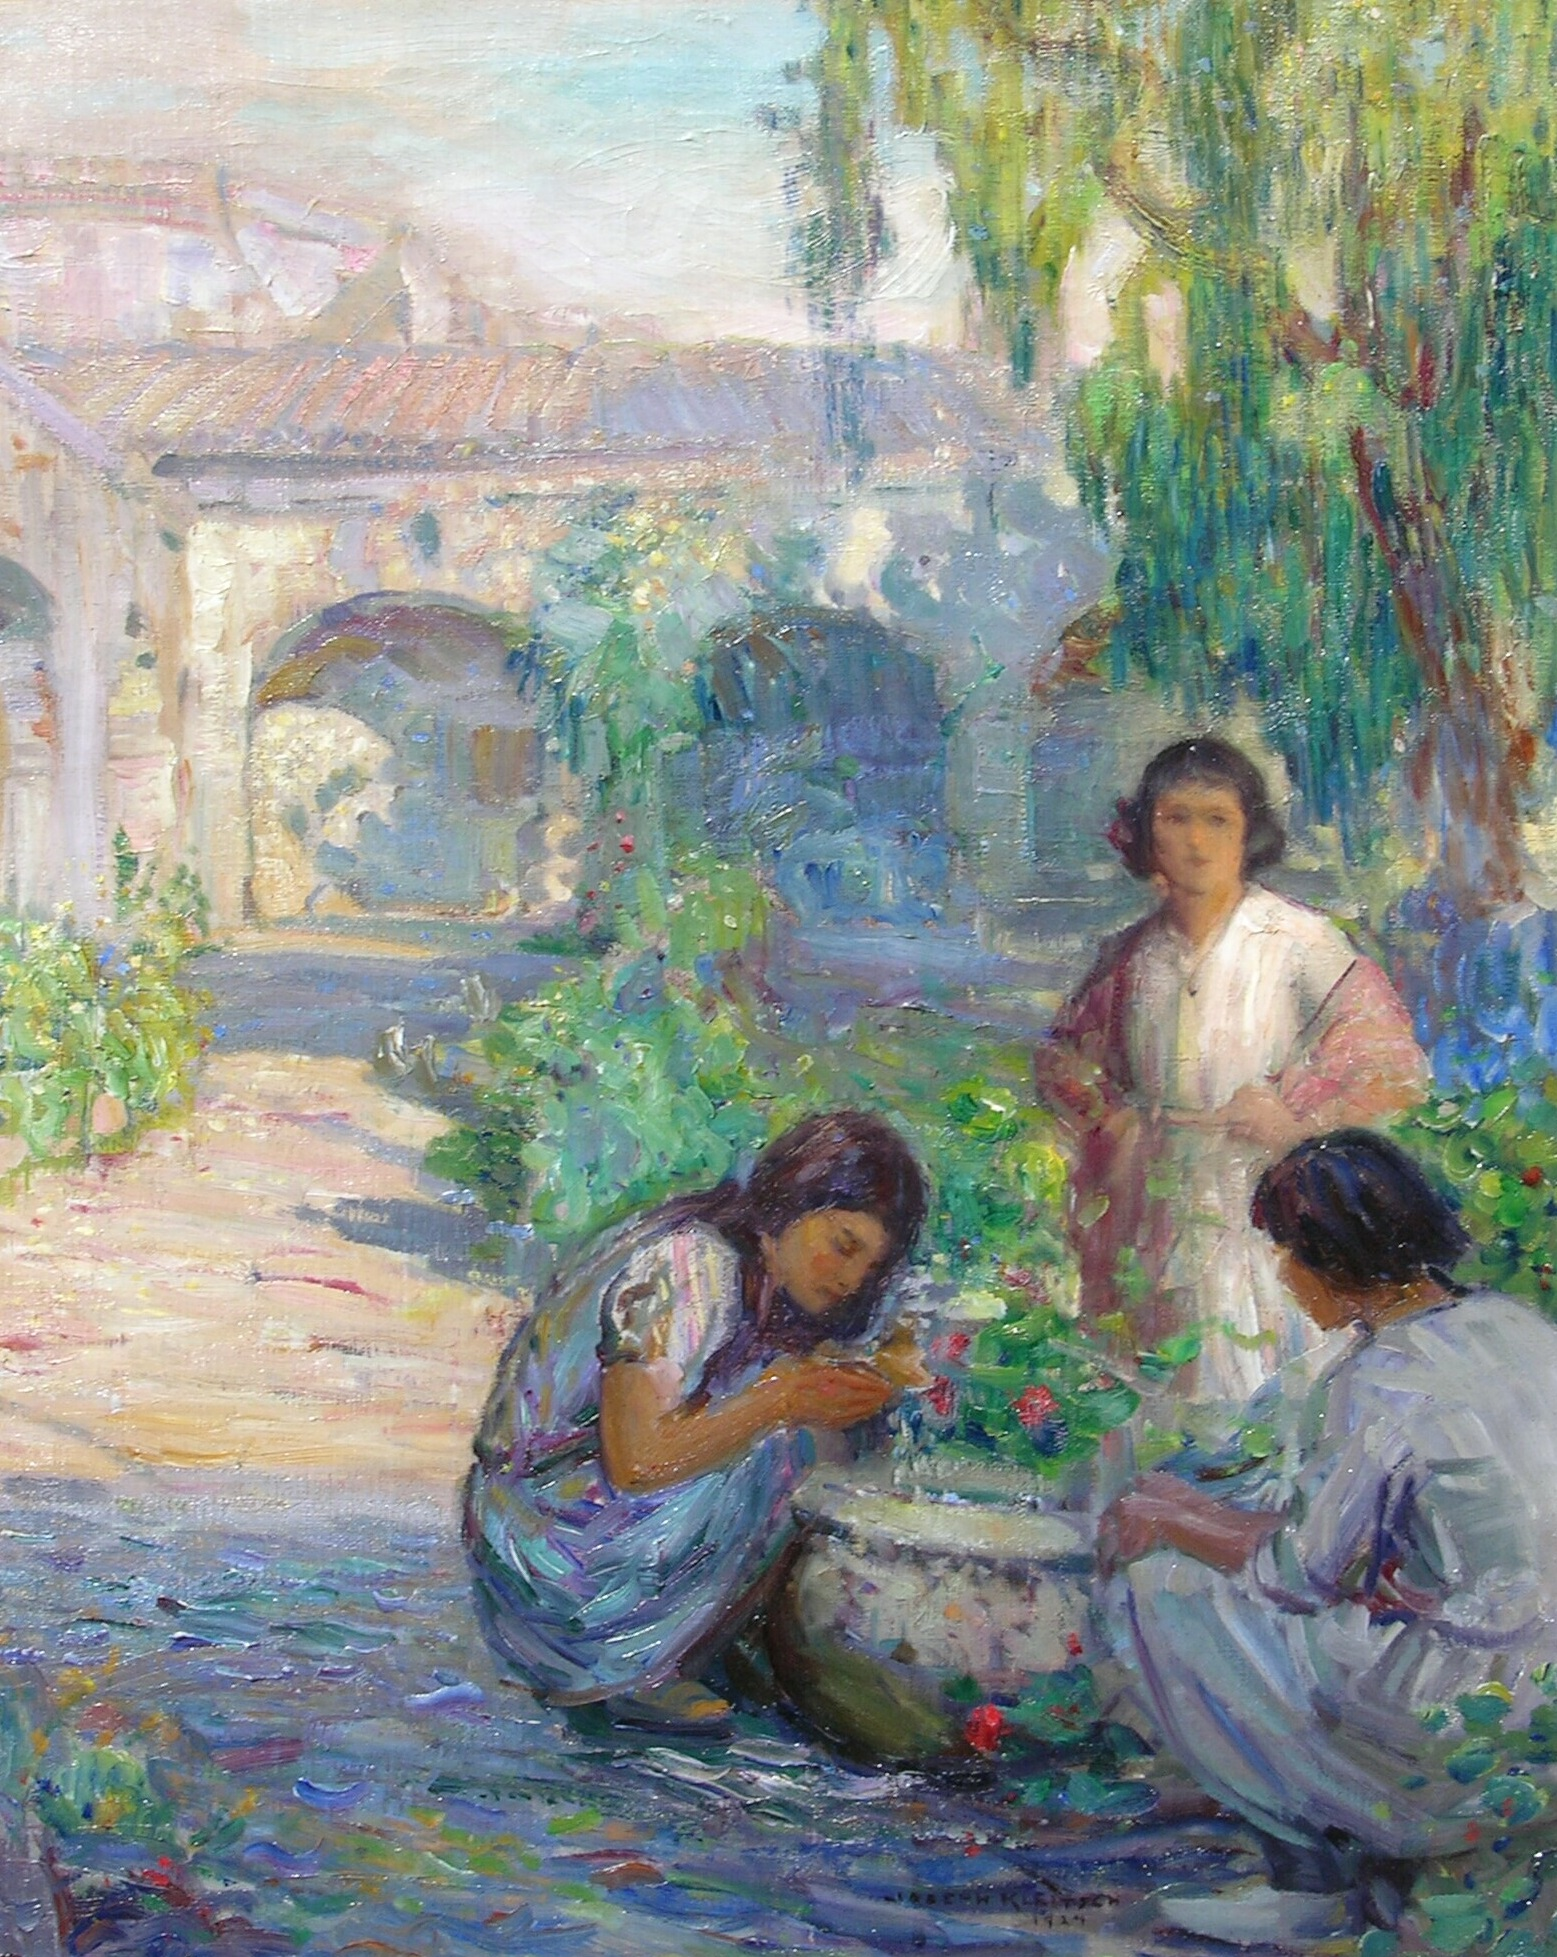 Children of Capistrano   / Oil on Canvas, 30 x 24 in. / Private Collection